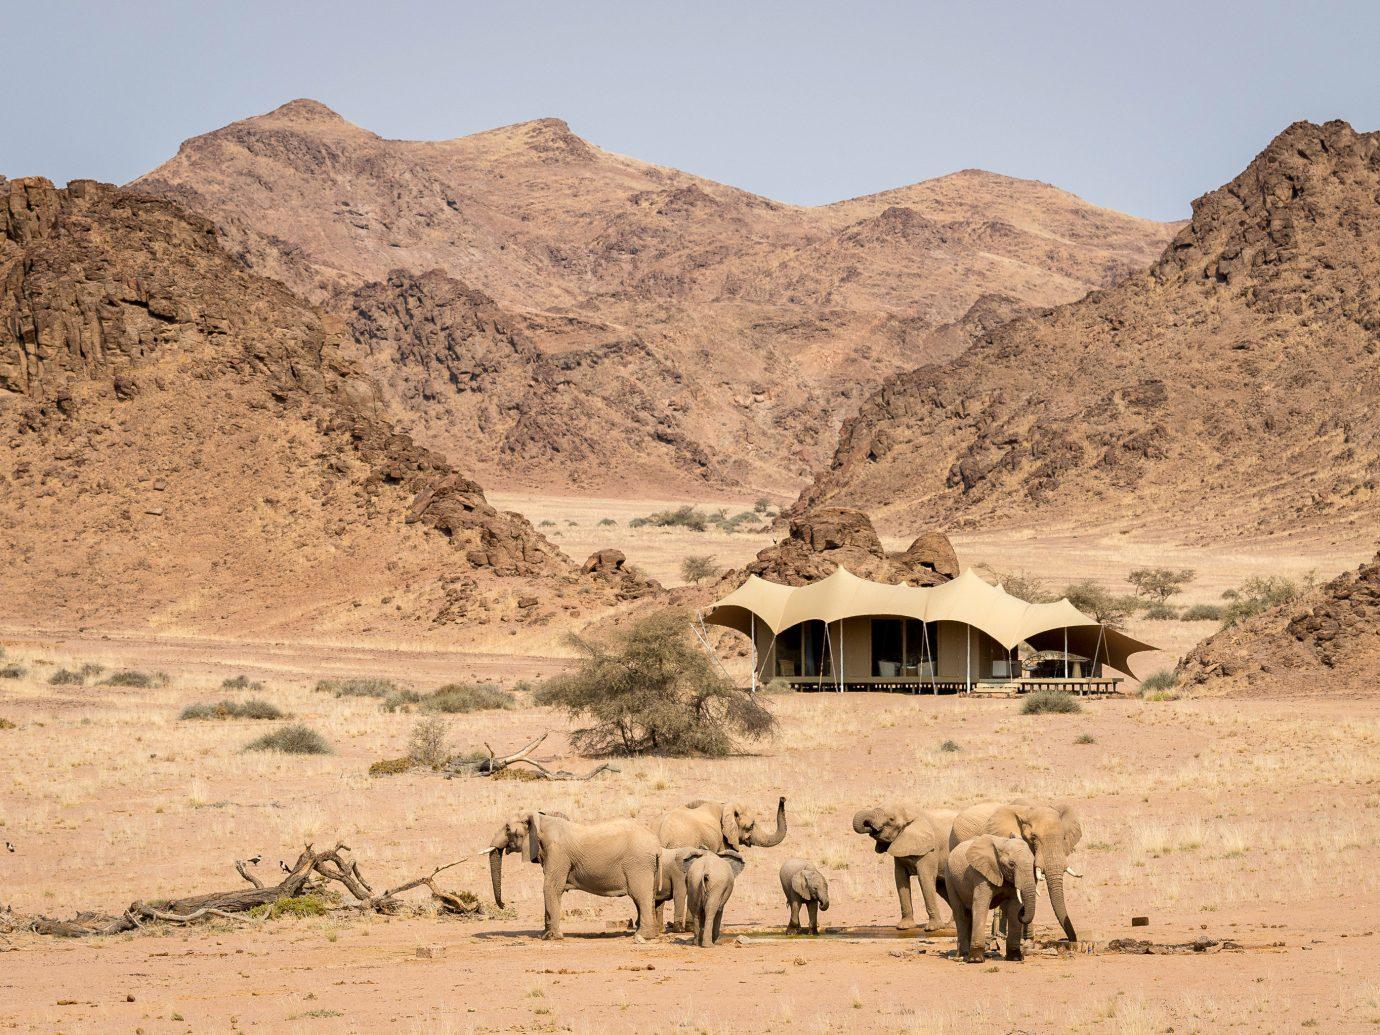 Hotels mountain outdoor sky ground Desert natural environment wilderness animal mammal wadi Camel steppe aeolian landform sahara savanna landscape herd valley dirt Wildlife plateau Safari Adventure arabian camel geology